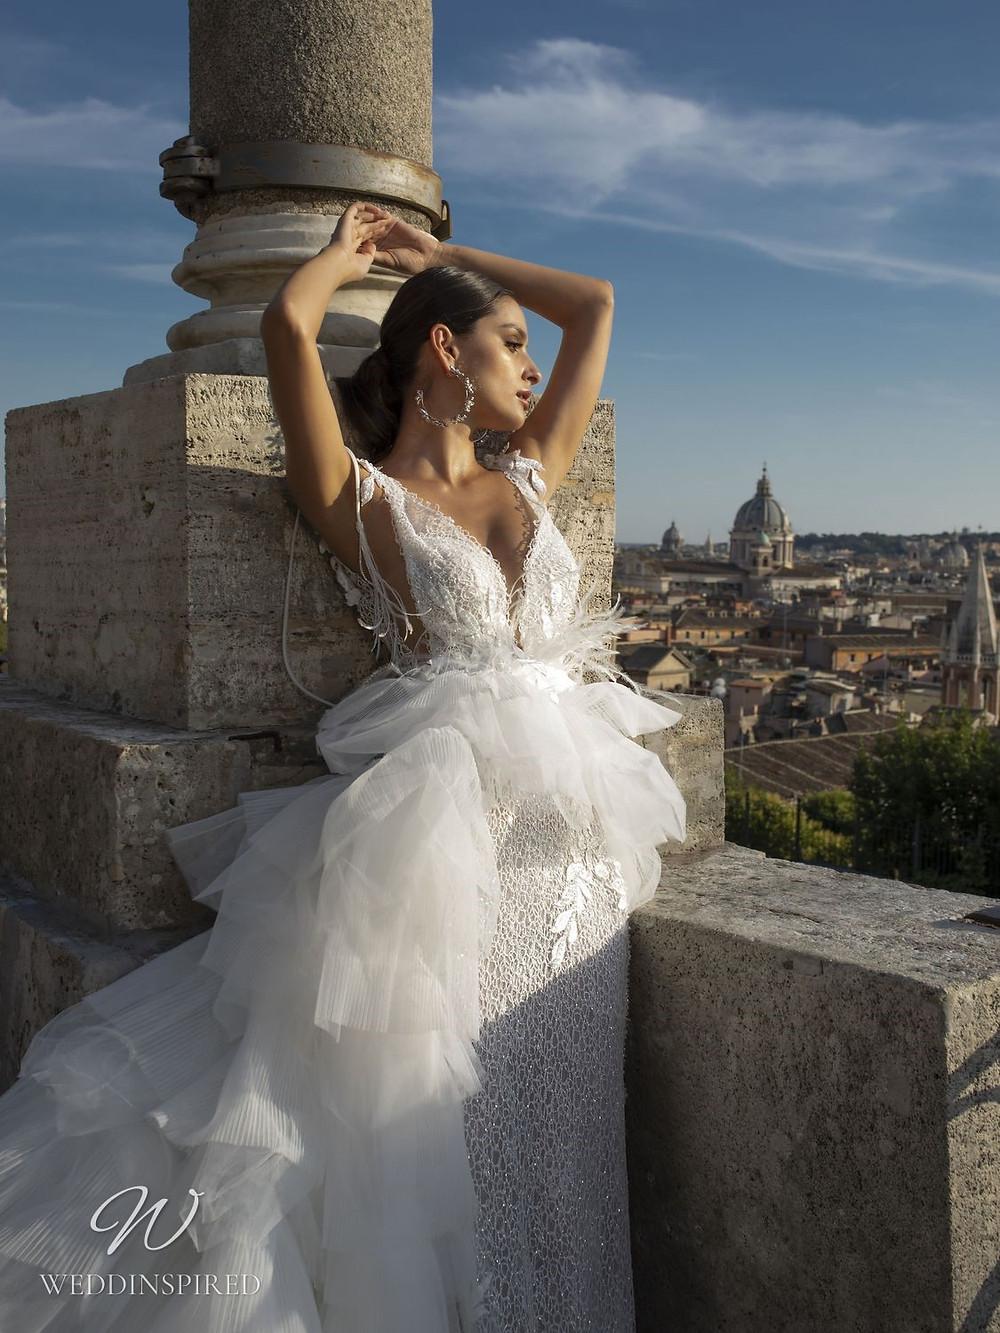 A Pinella Passaro mesh column wedding dress with a tulle detachable skirt